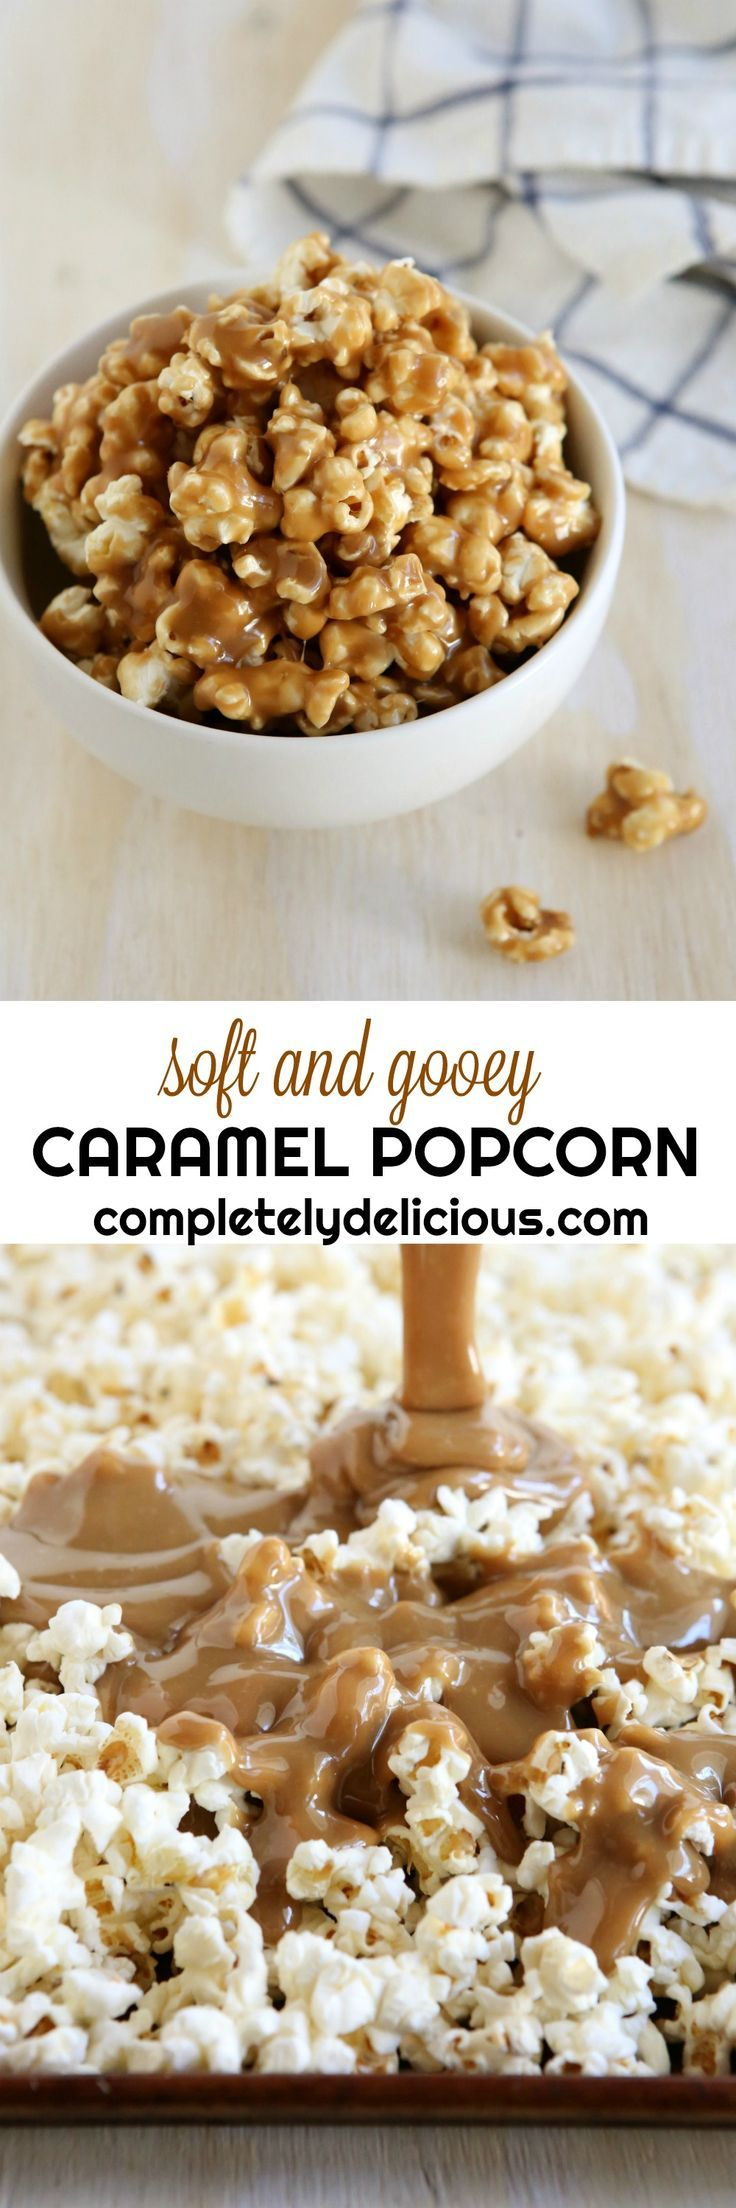 Soft and Gooey Caramel Popcorn